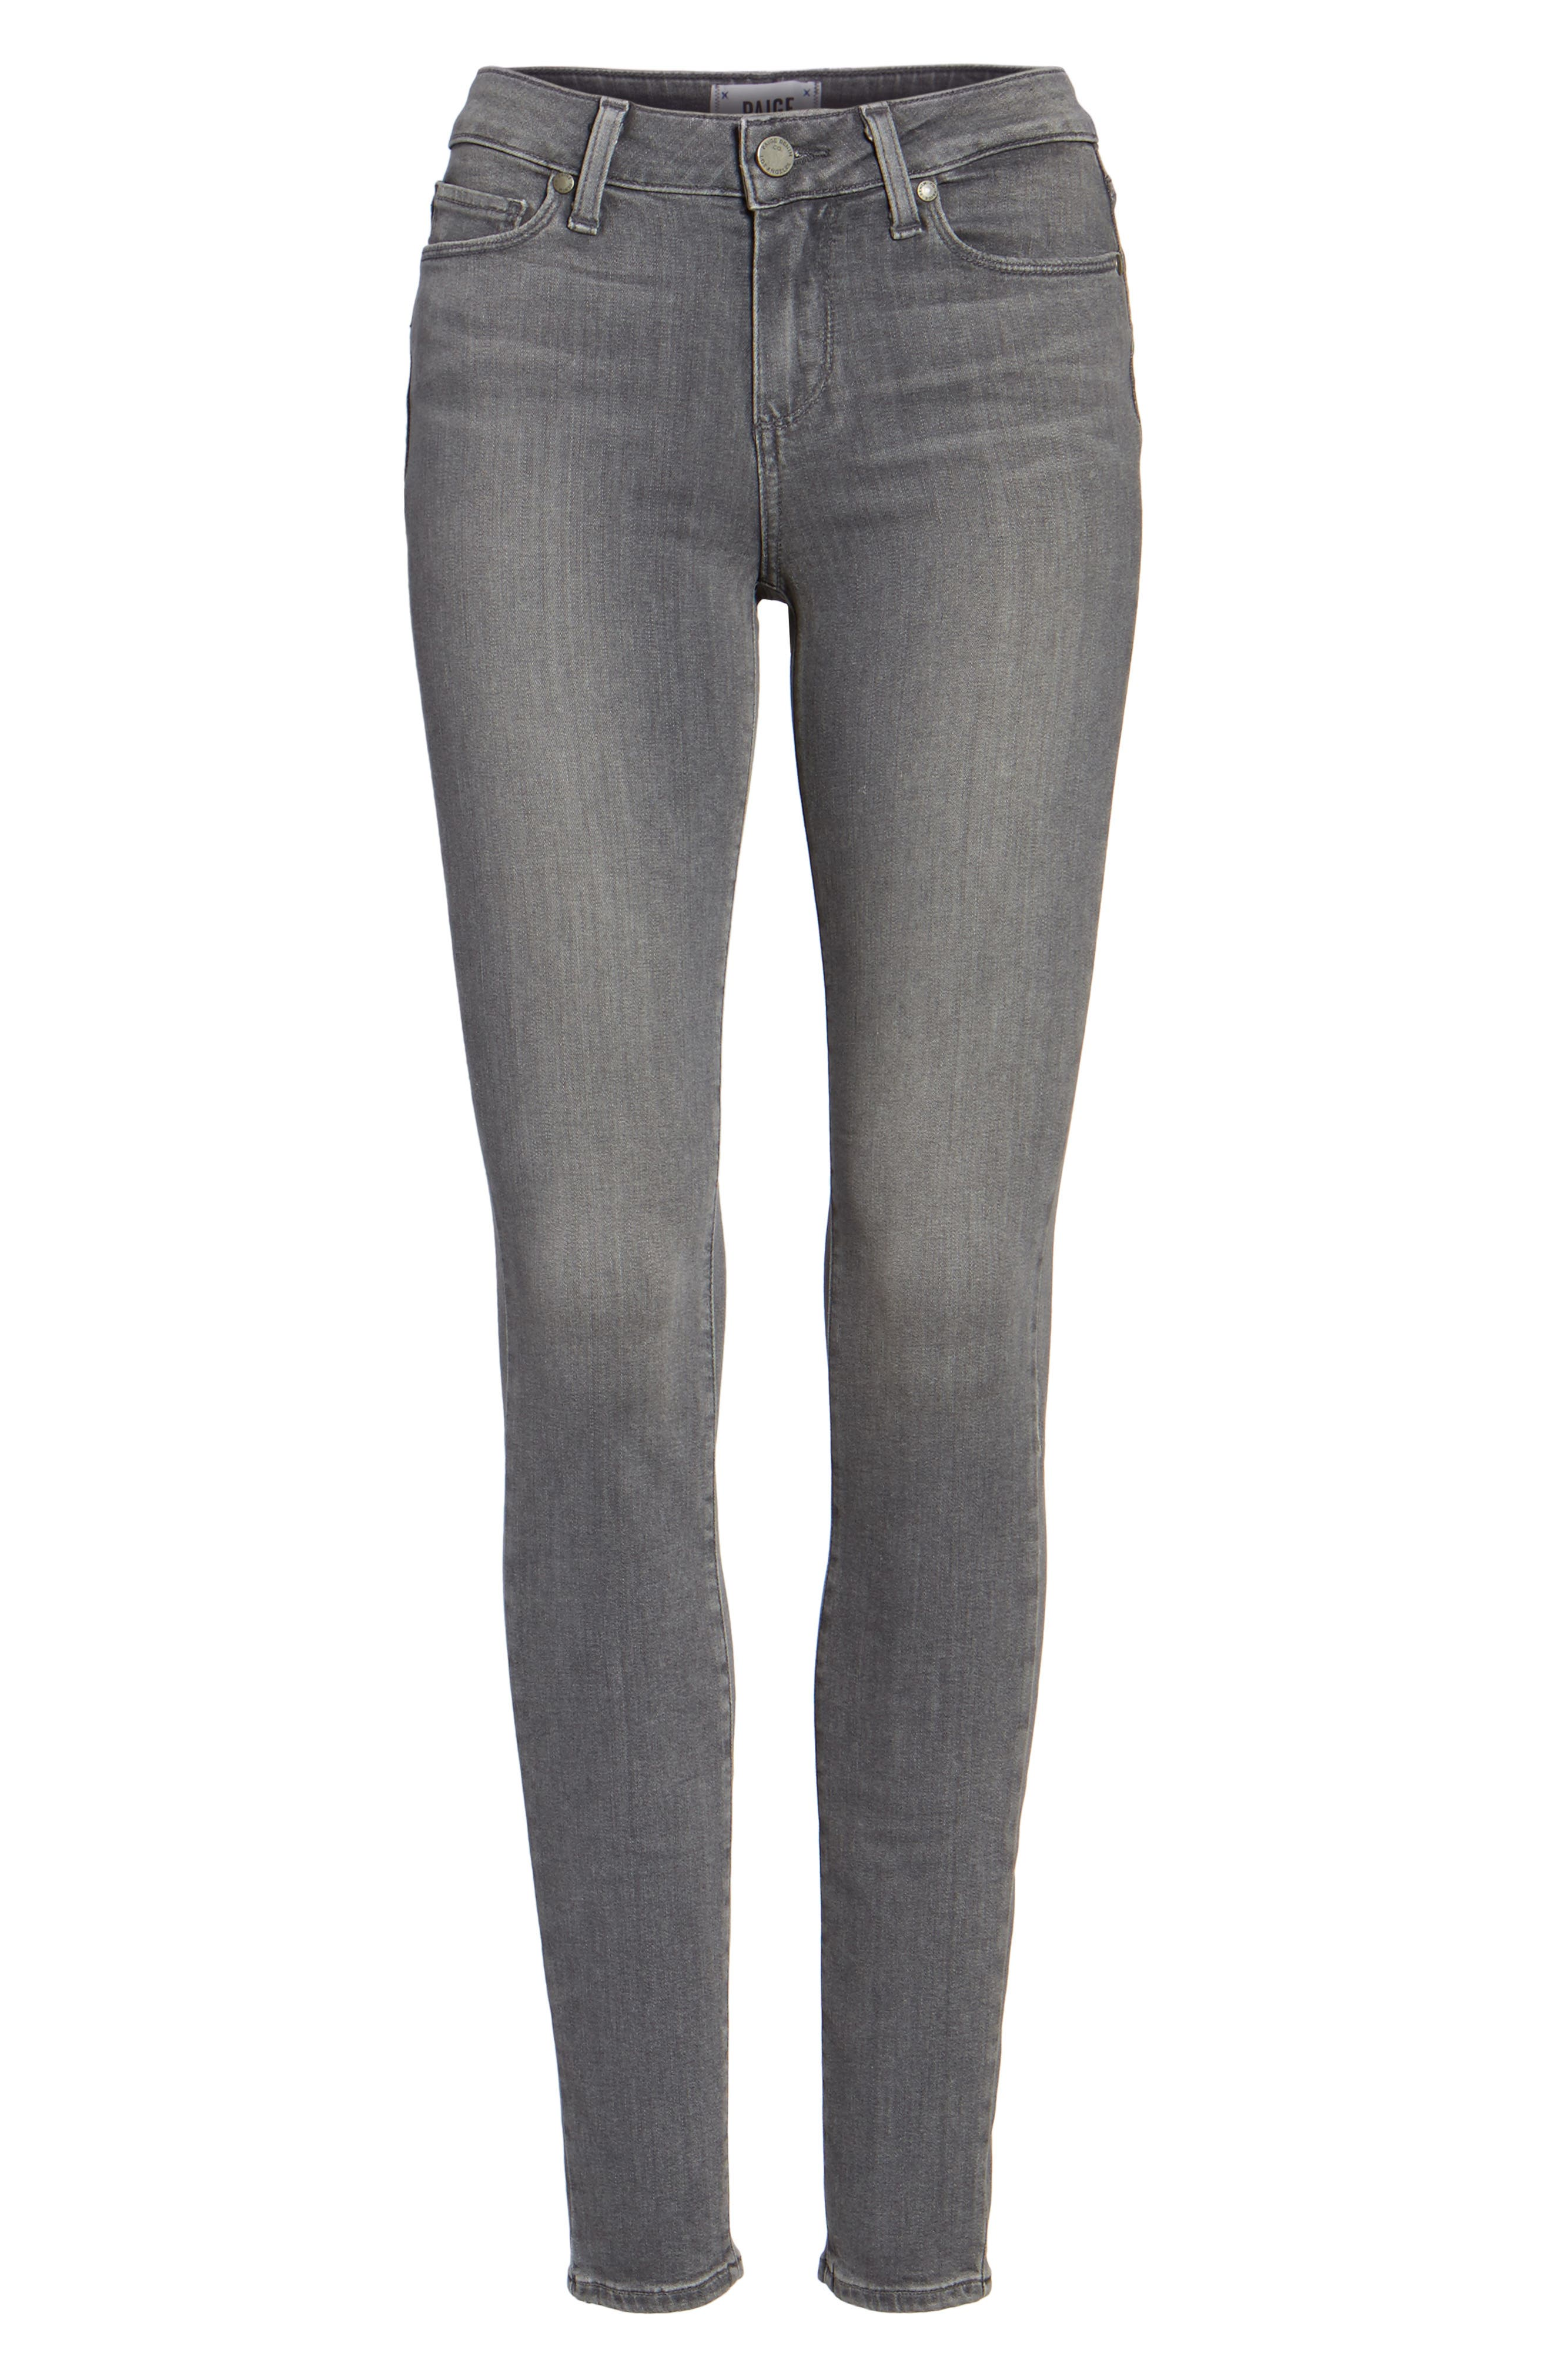 Transcend - Verdugo Ultra Skinny Jeans,                             Main thumbnail 1, color,                             SILVIE